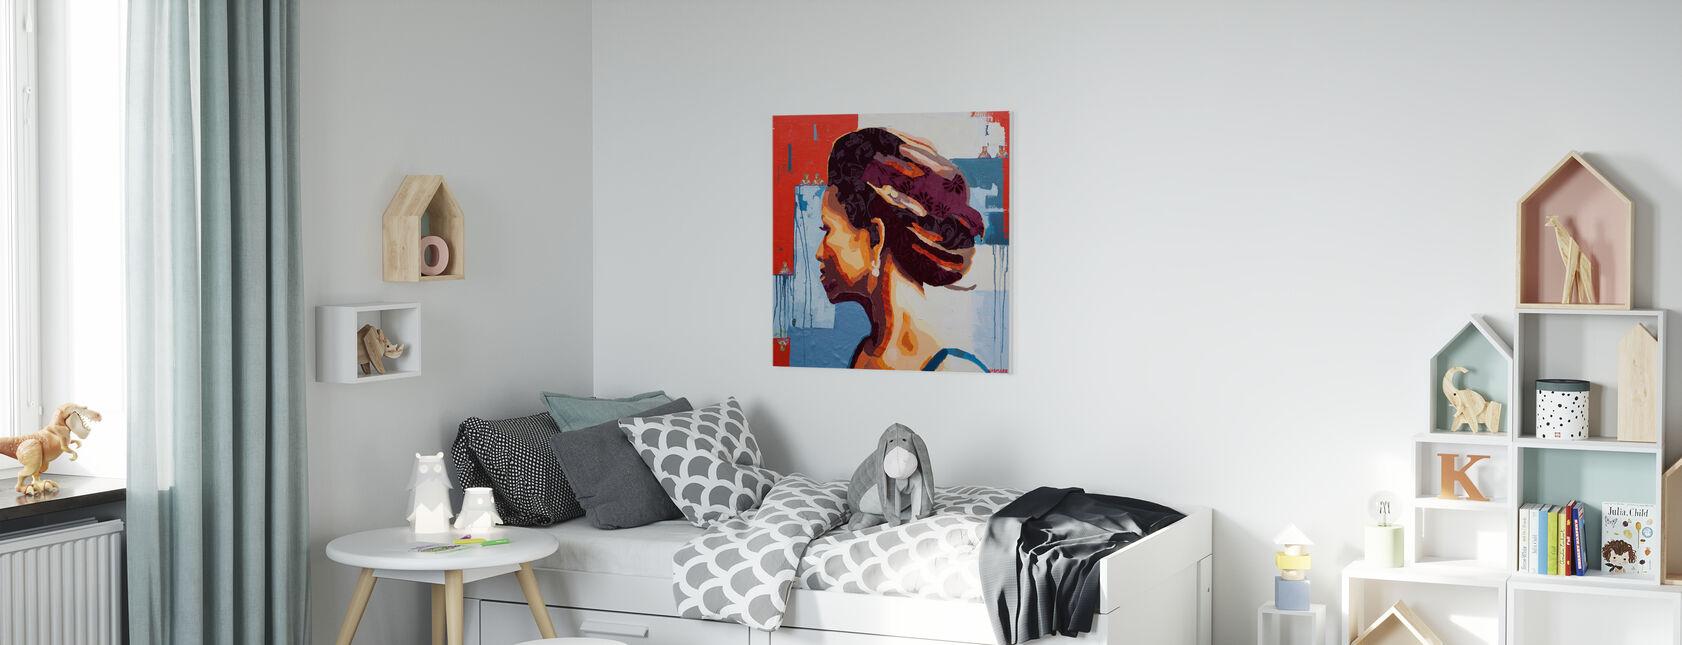 Queen of Spades - Canvas print - Kids Room